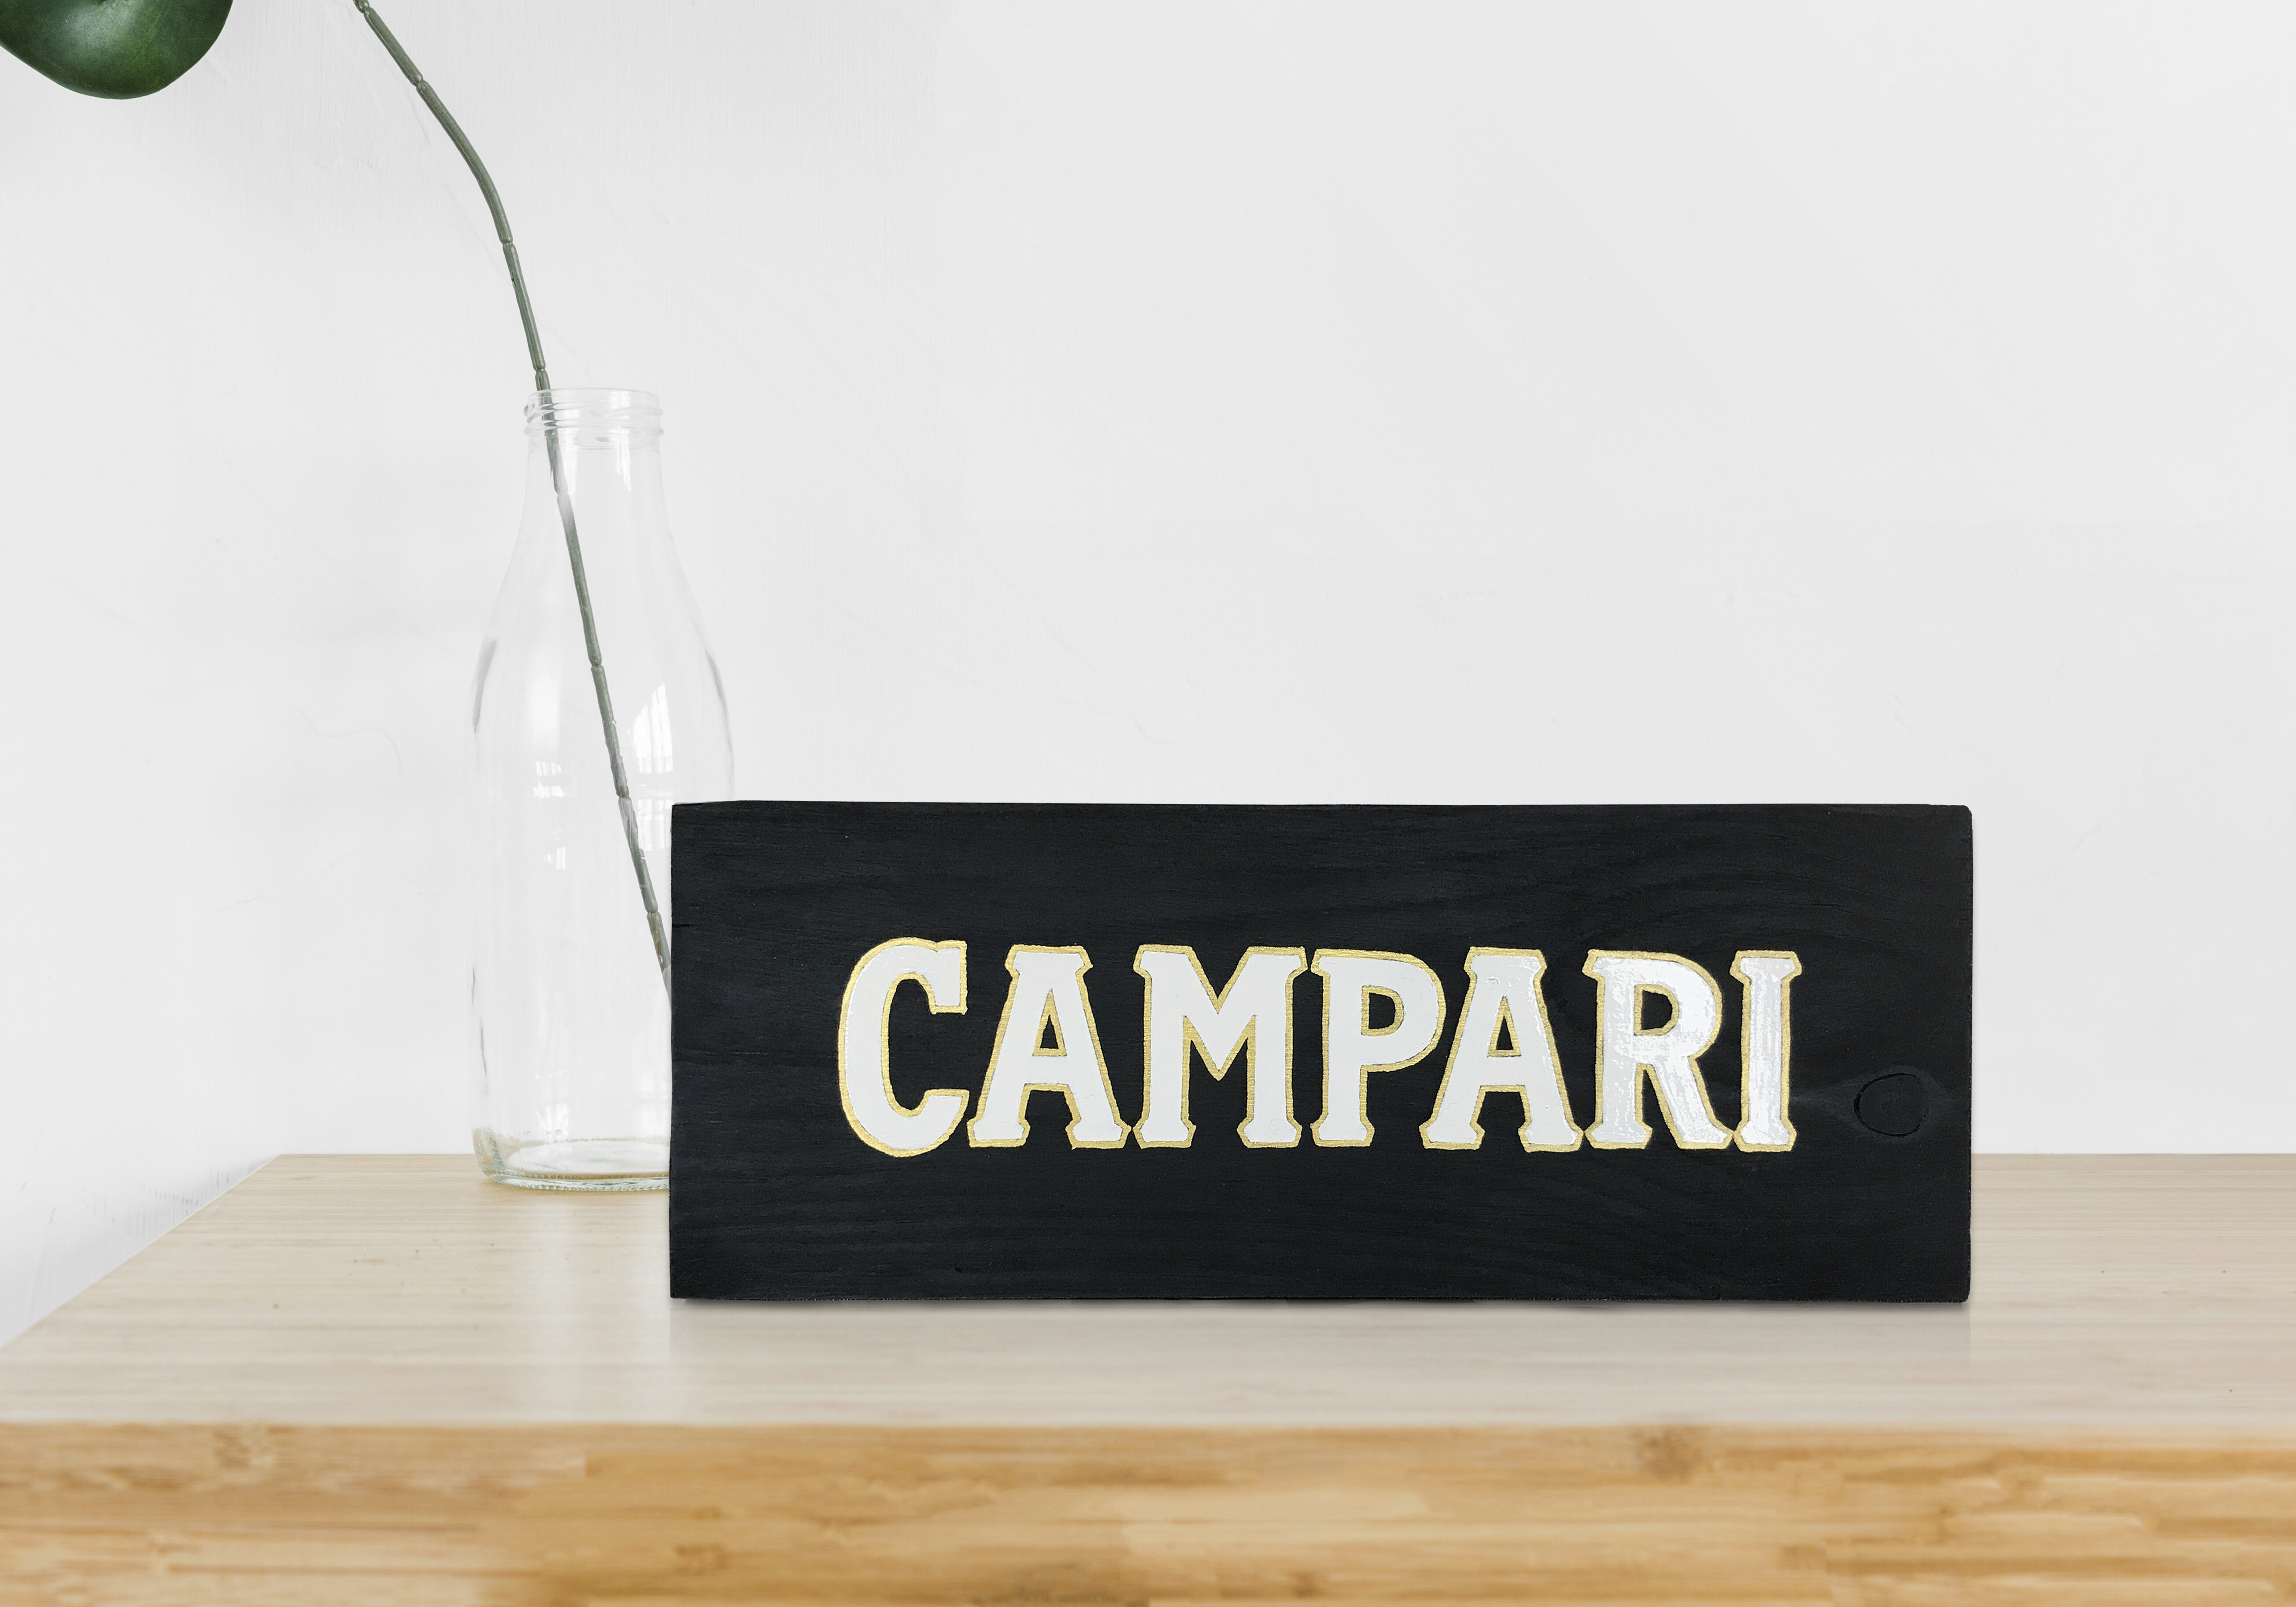 CAMPARI WOOD SIGN 100€